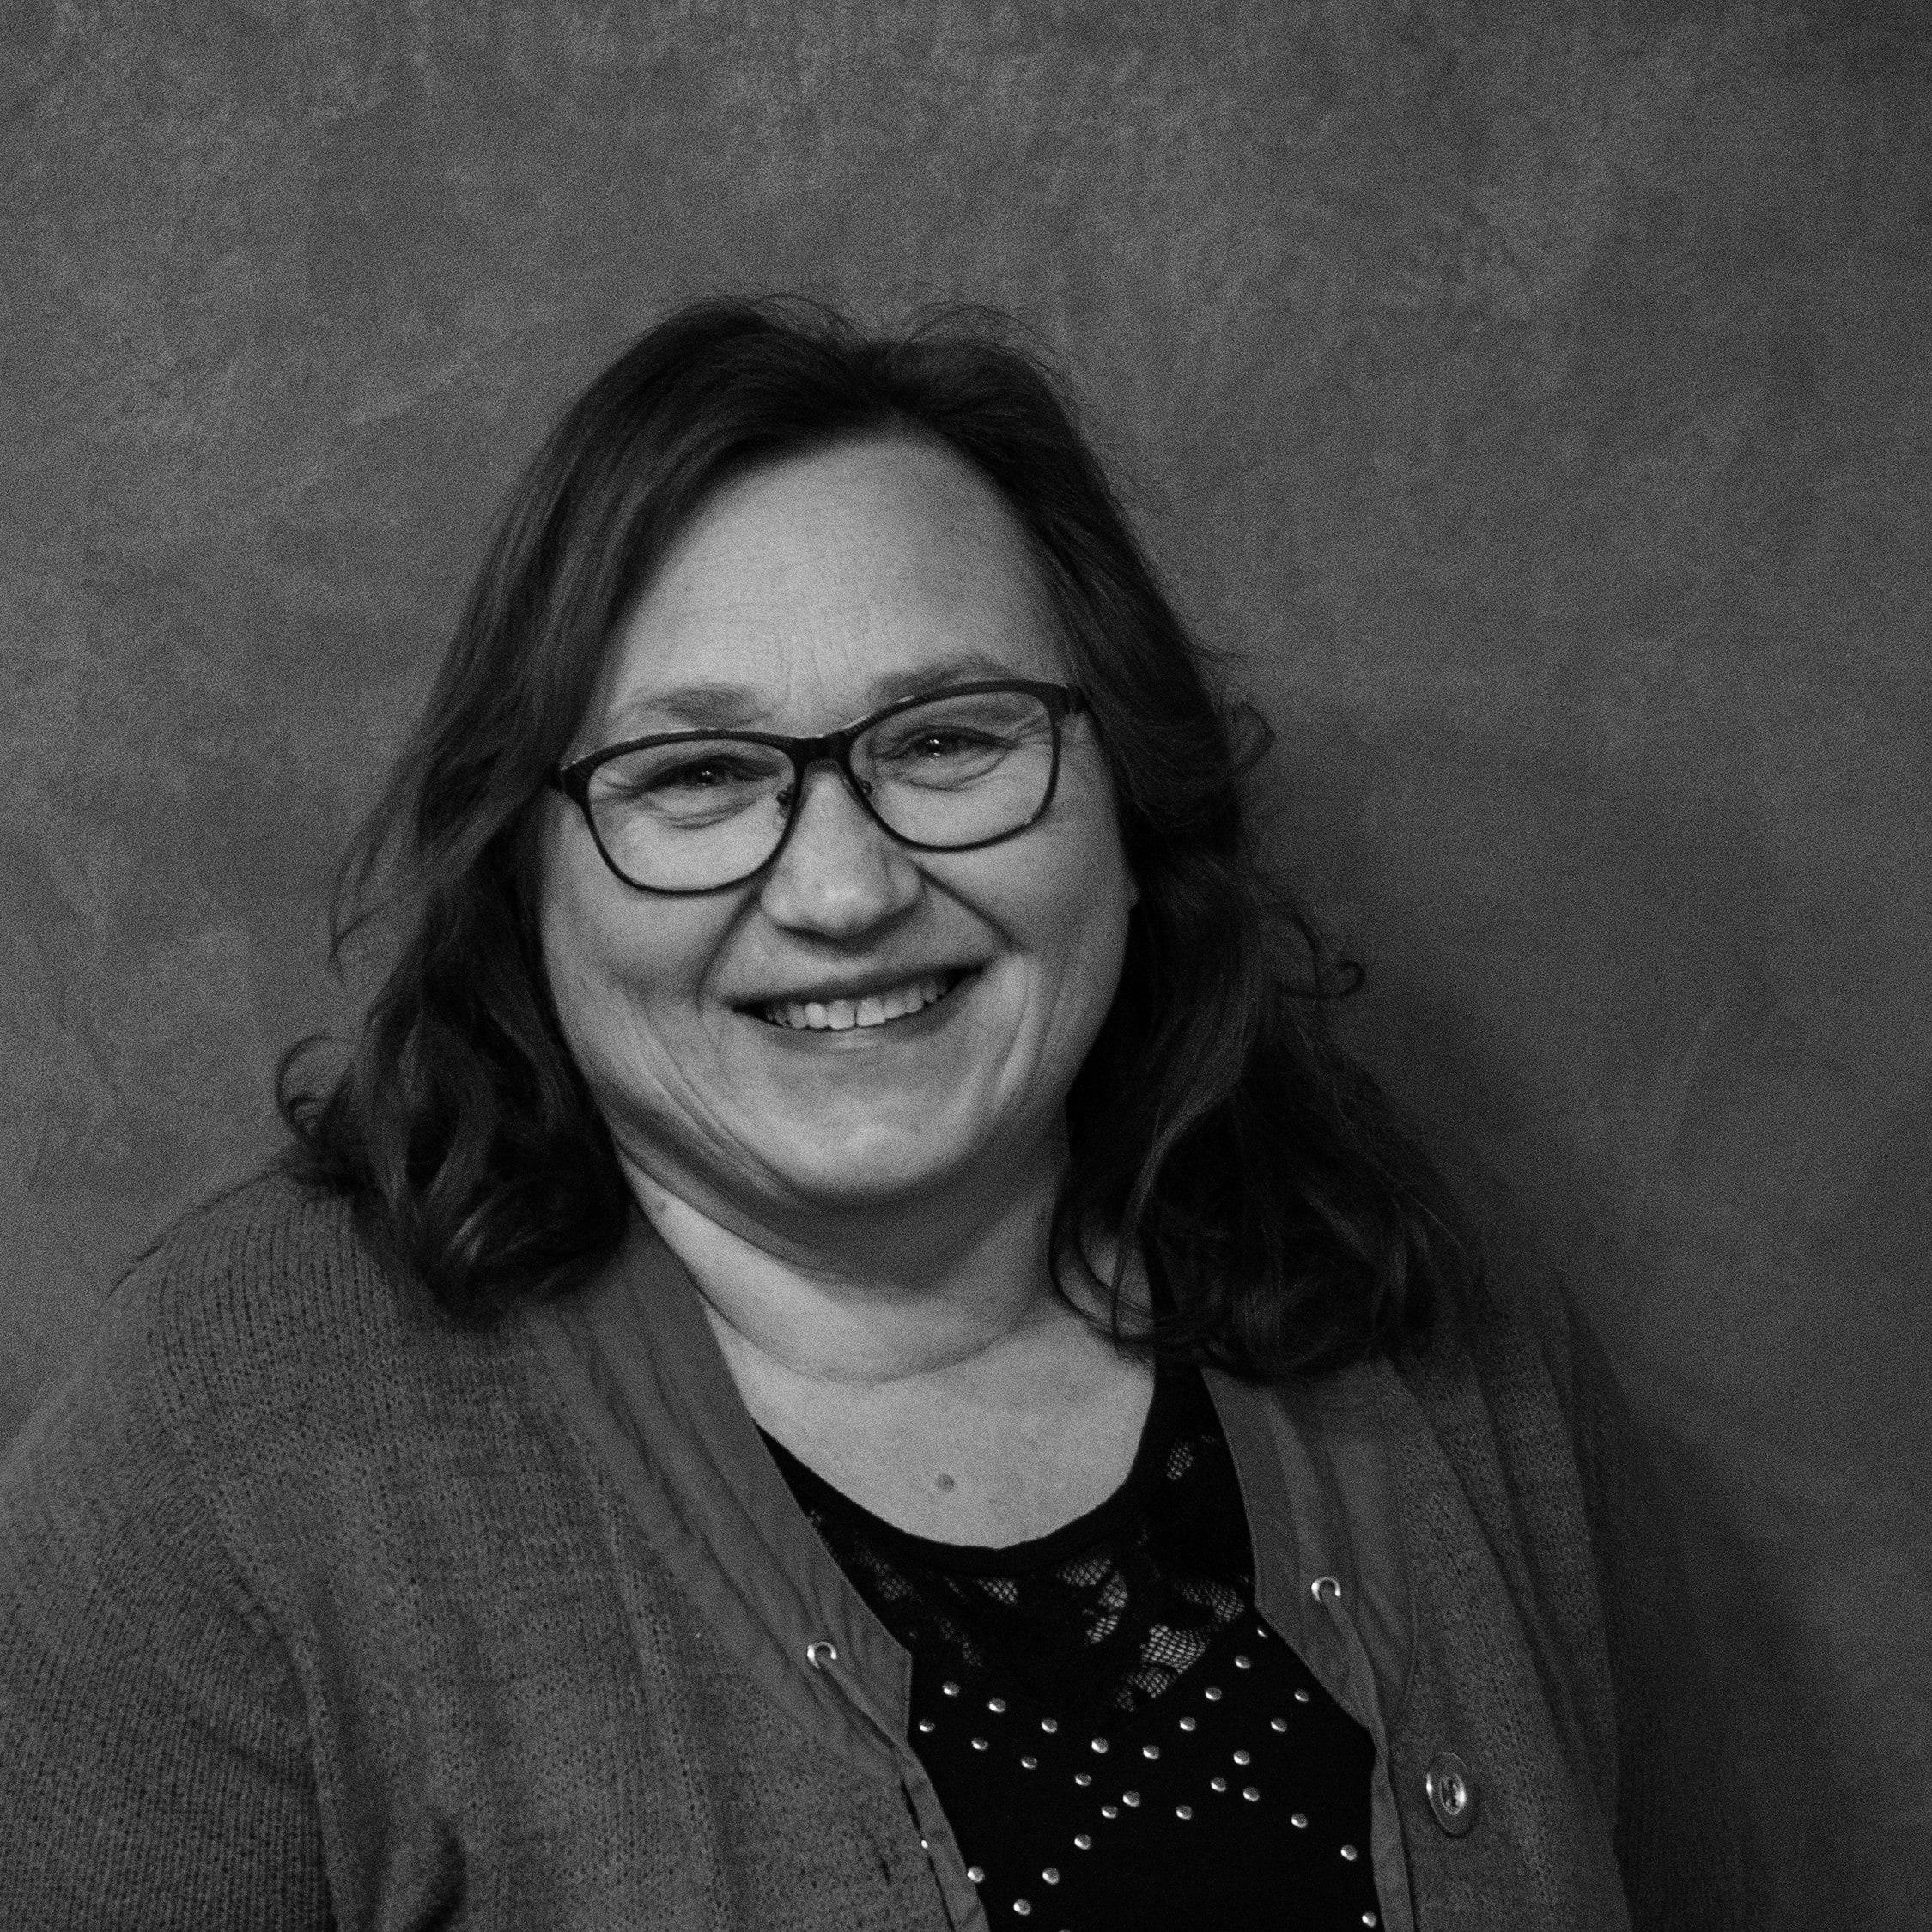 Berta Baumann Profilbild schwarz weiß Geschäftsführung